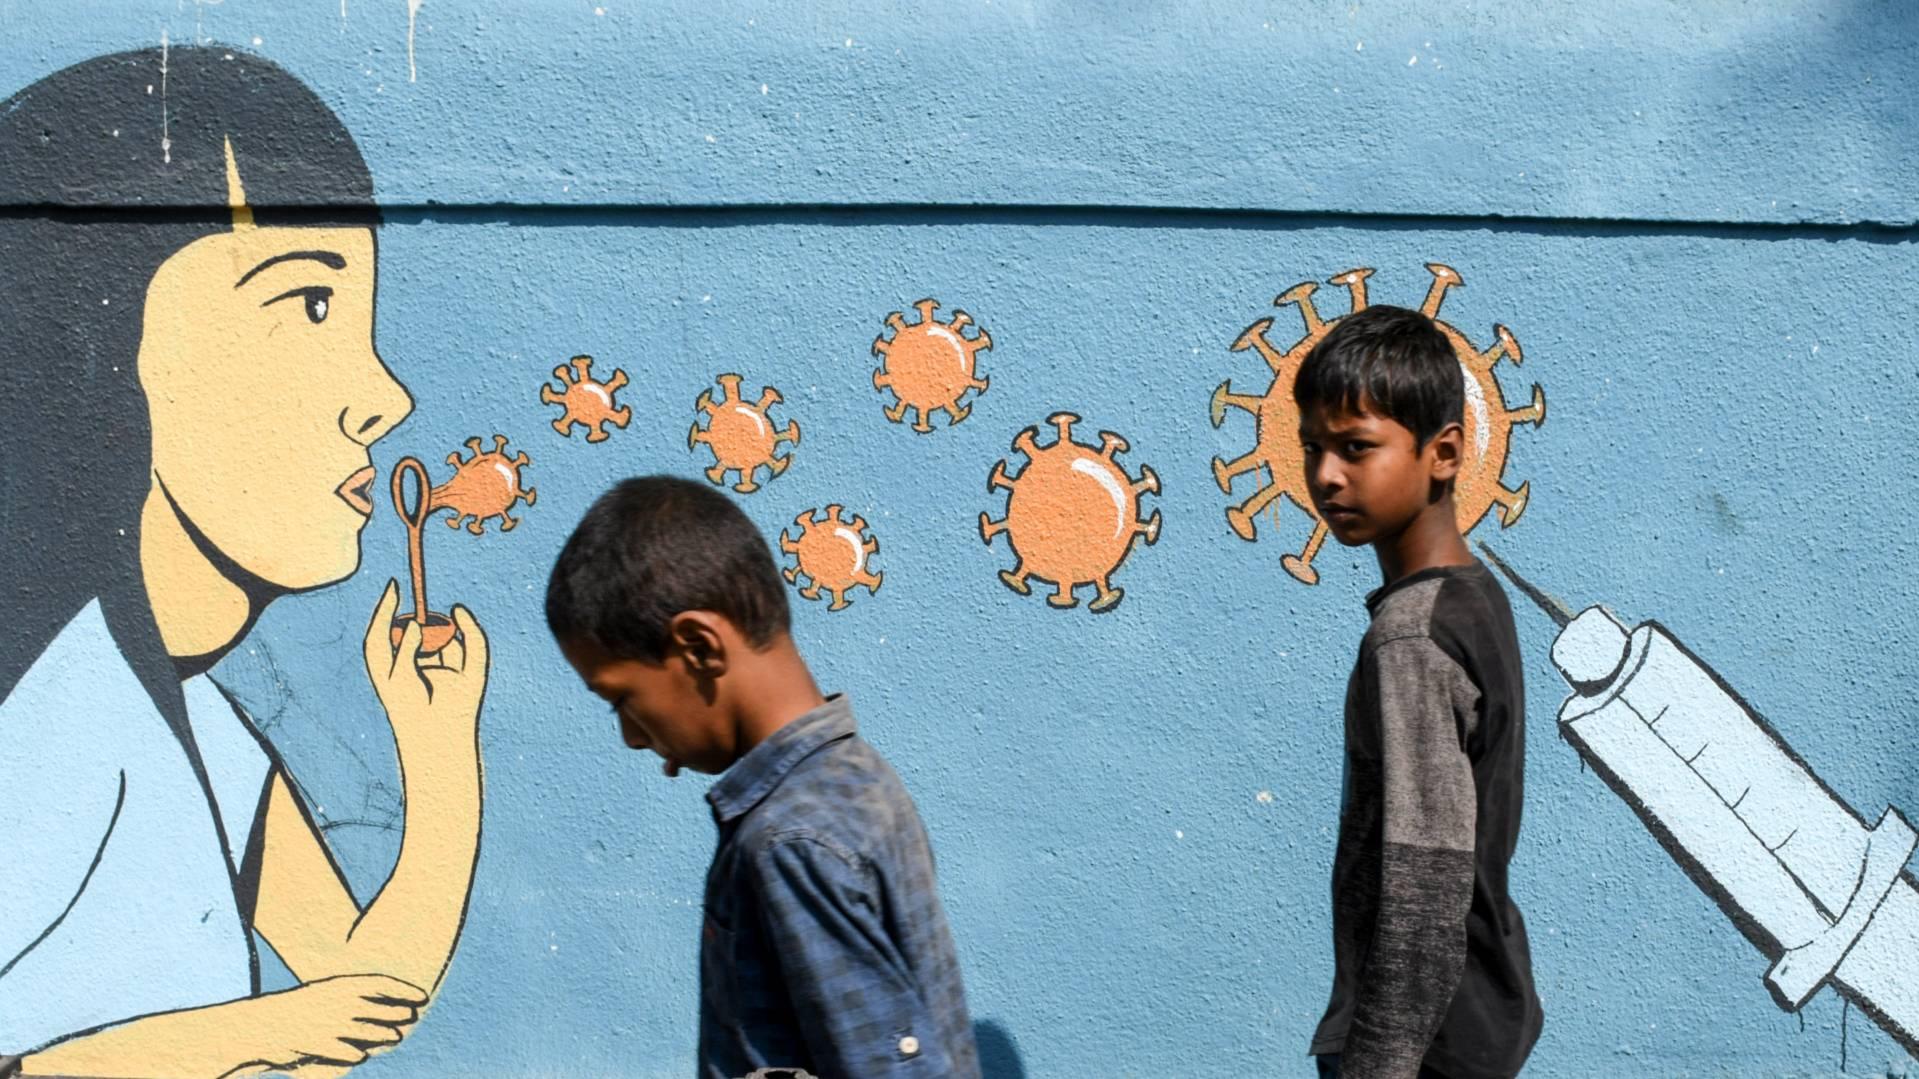 <p>Фото © Ashish Vaishnav / SOPA Images / LightRocket via Getty Images</p>